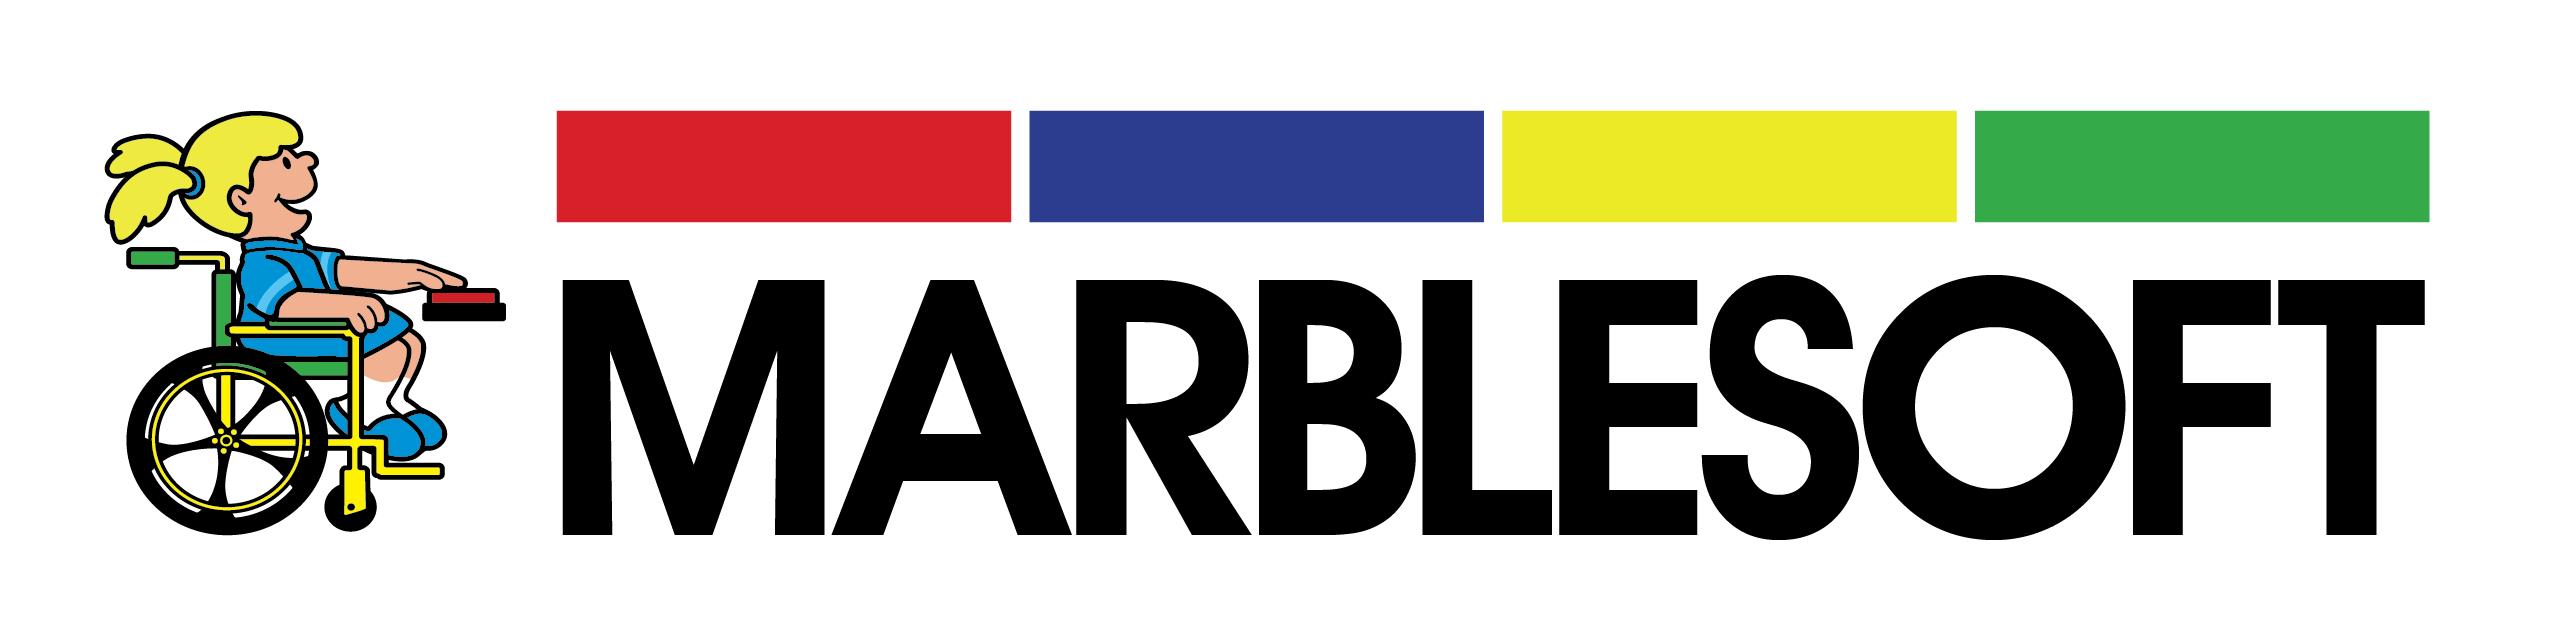 Marblesoft